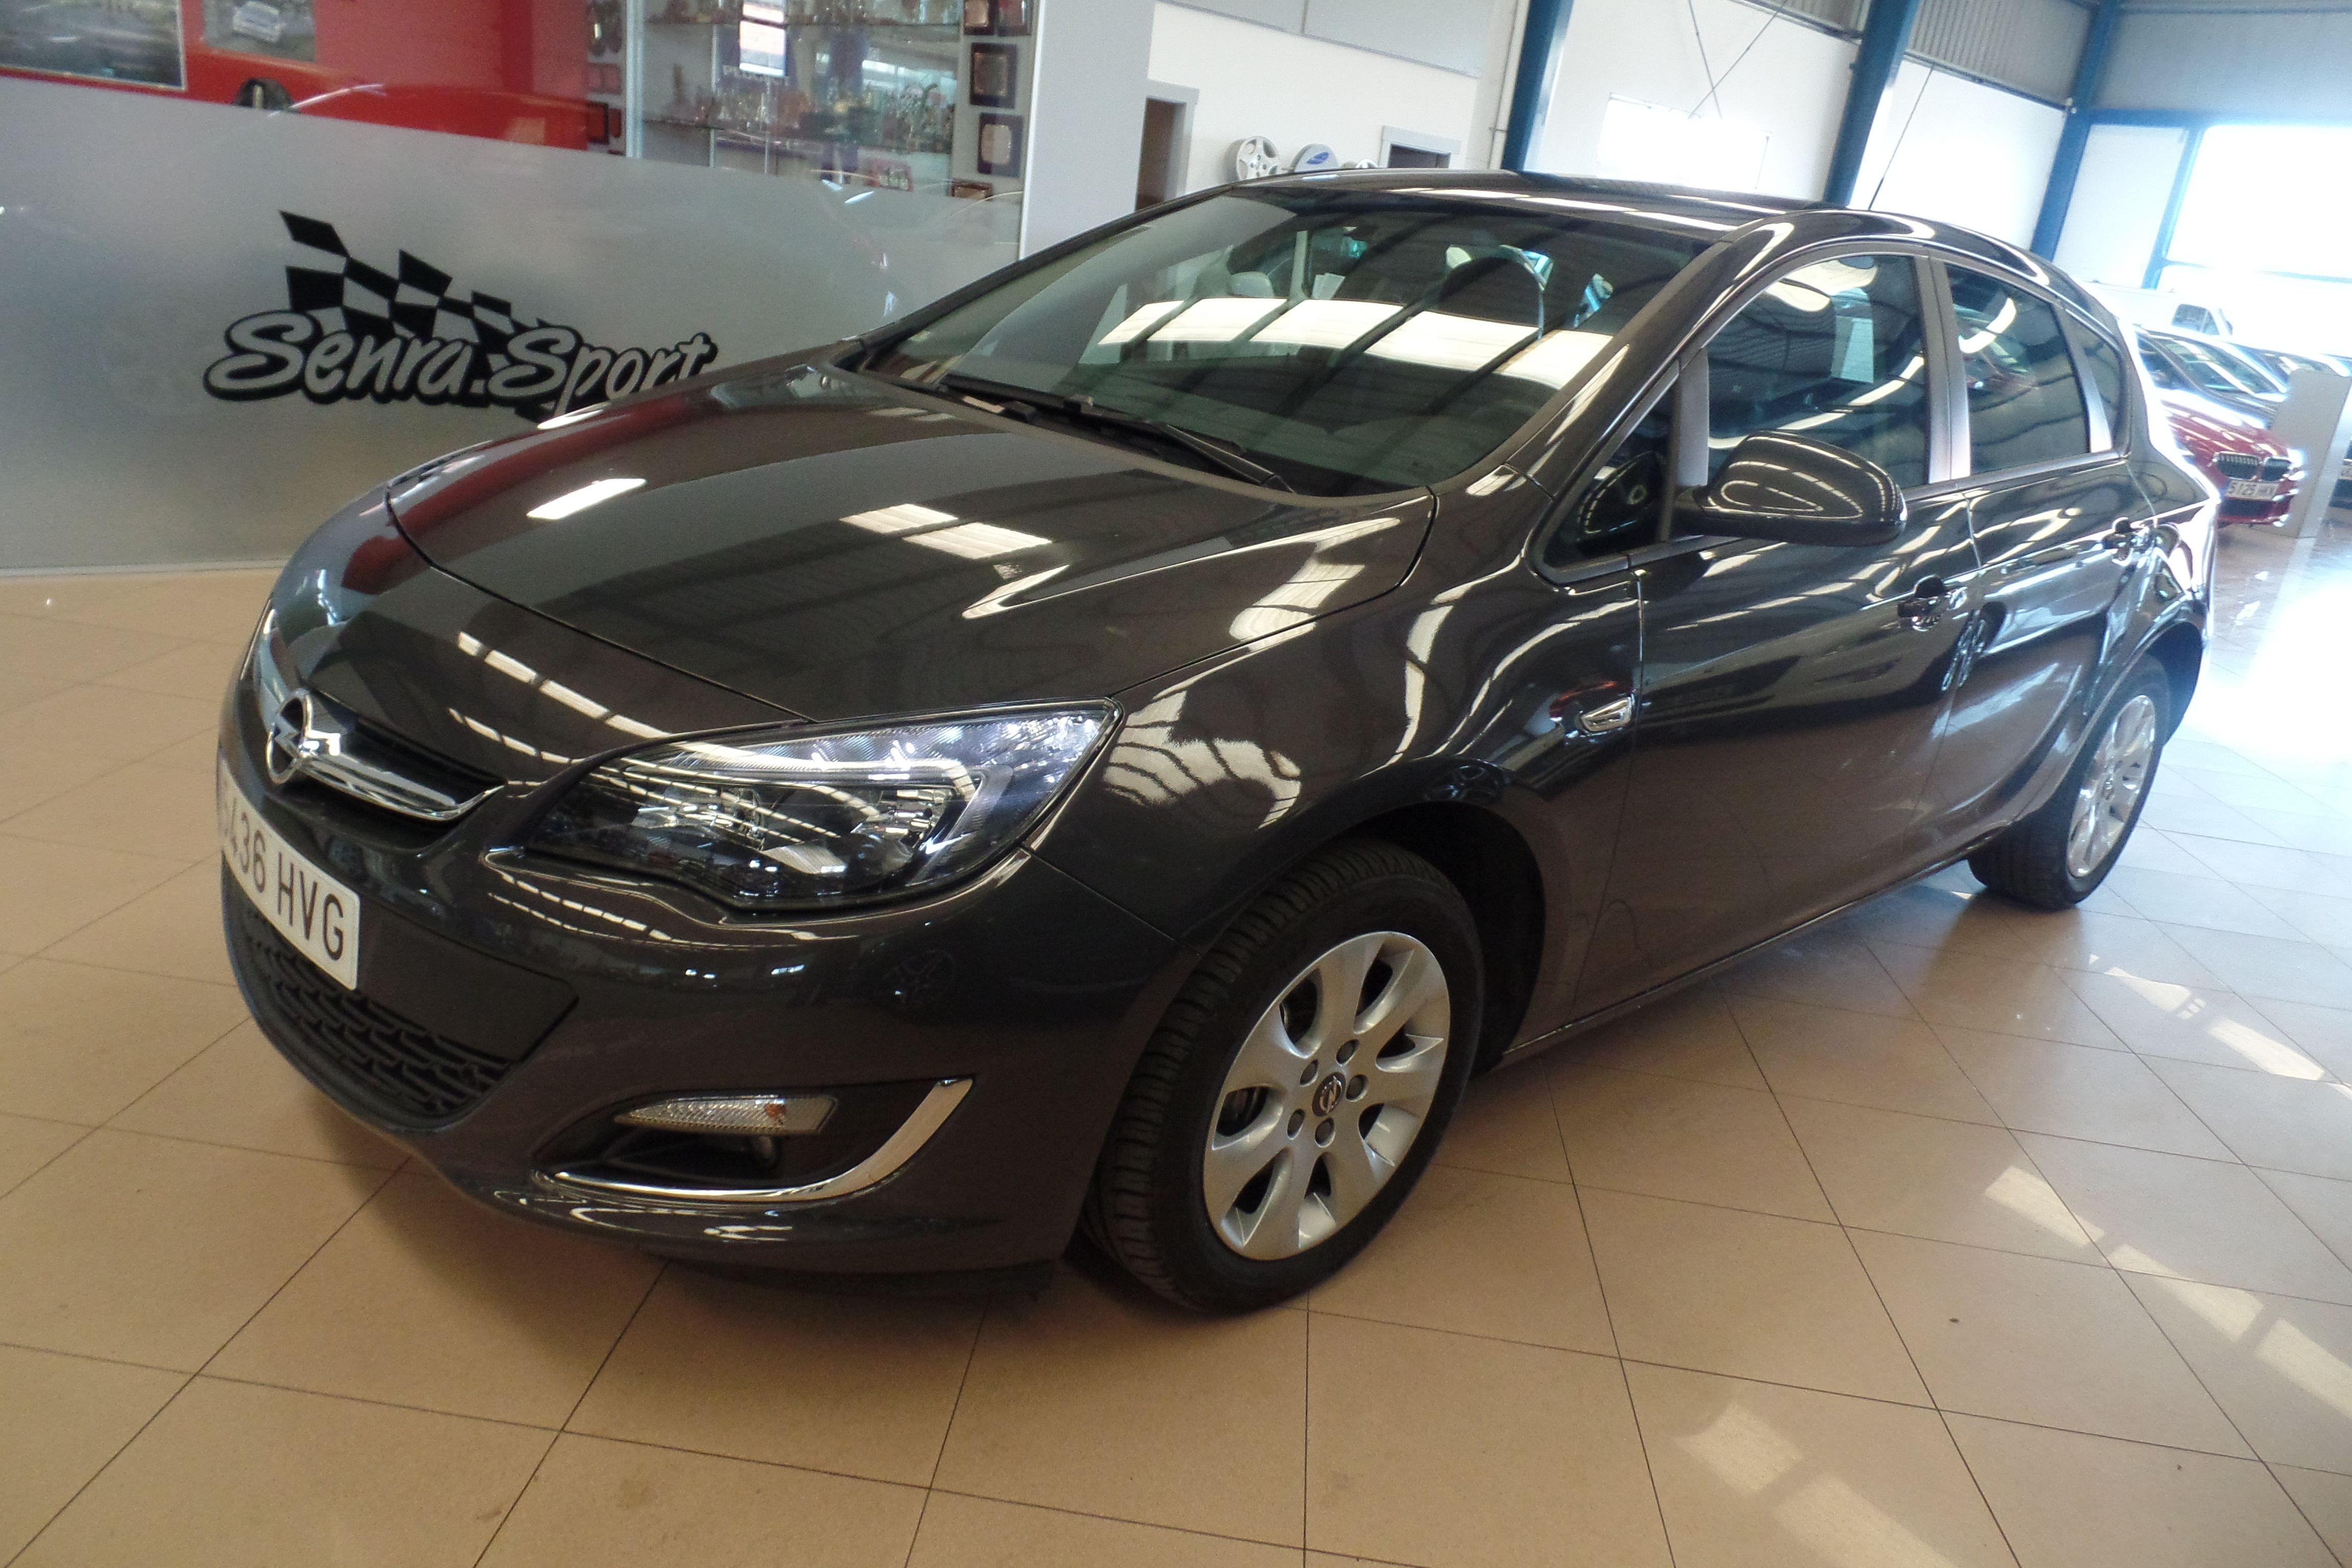 OPEL Astra 1.7 CDTi 110 CV Business (5436-HVG): Servicios Peugeot de Senra Sport